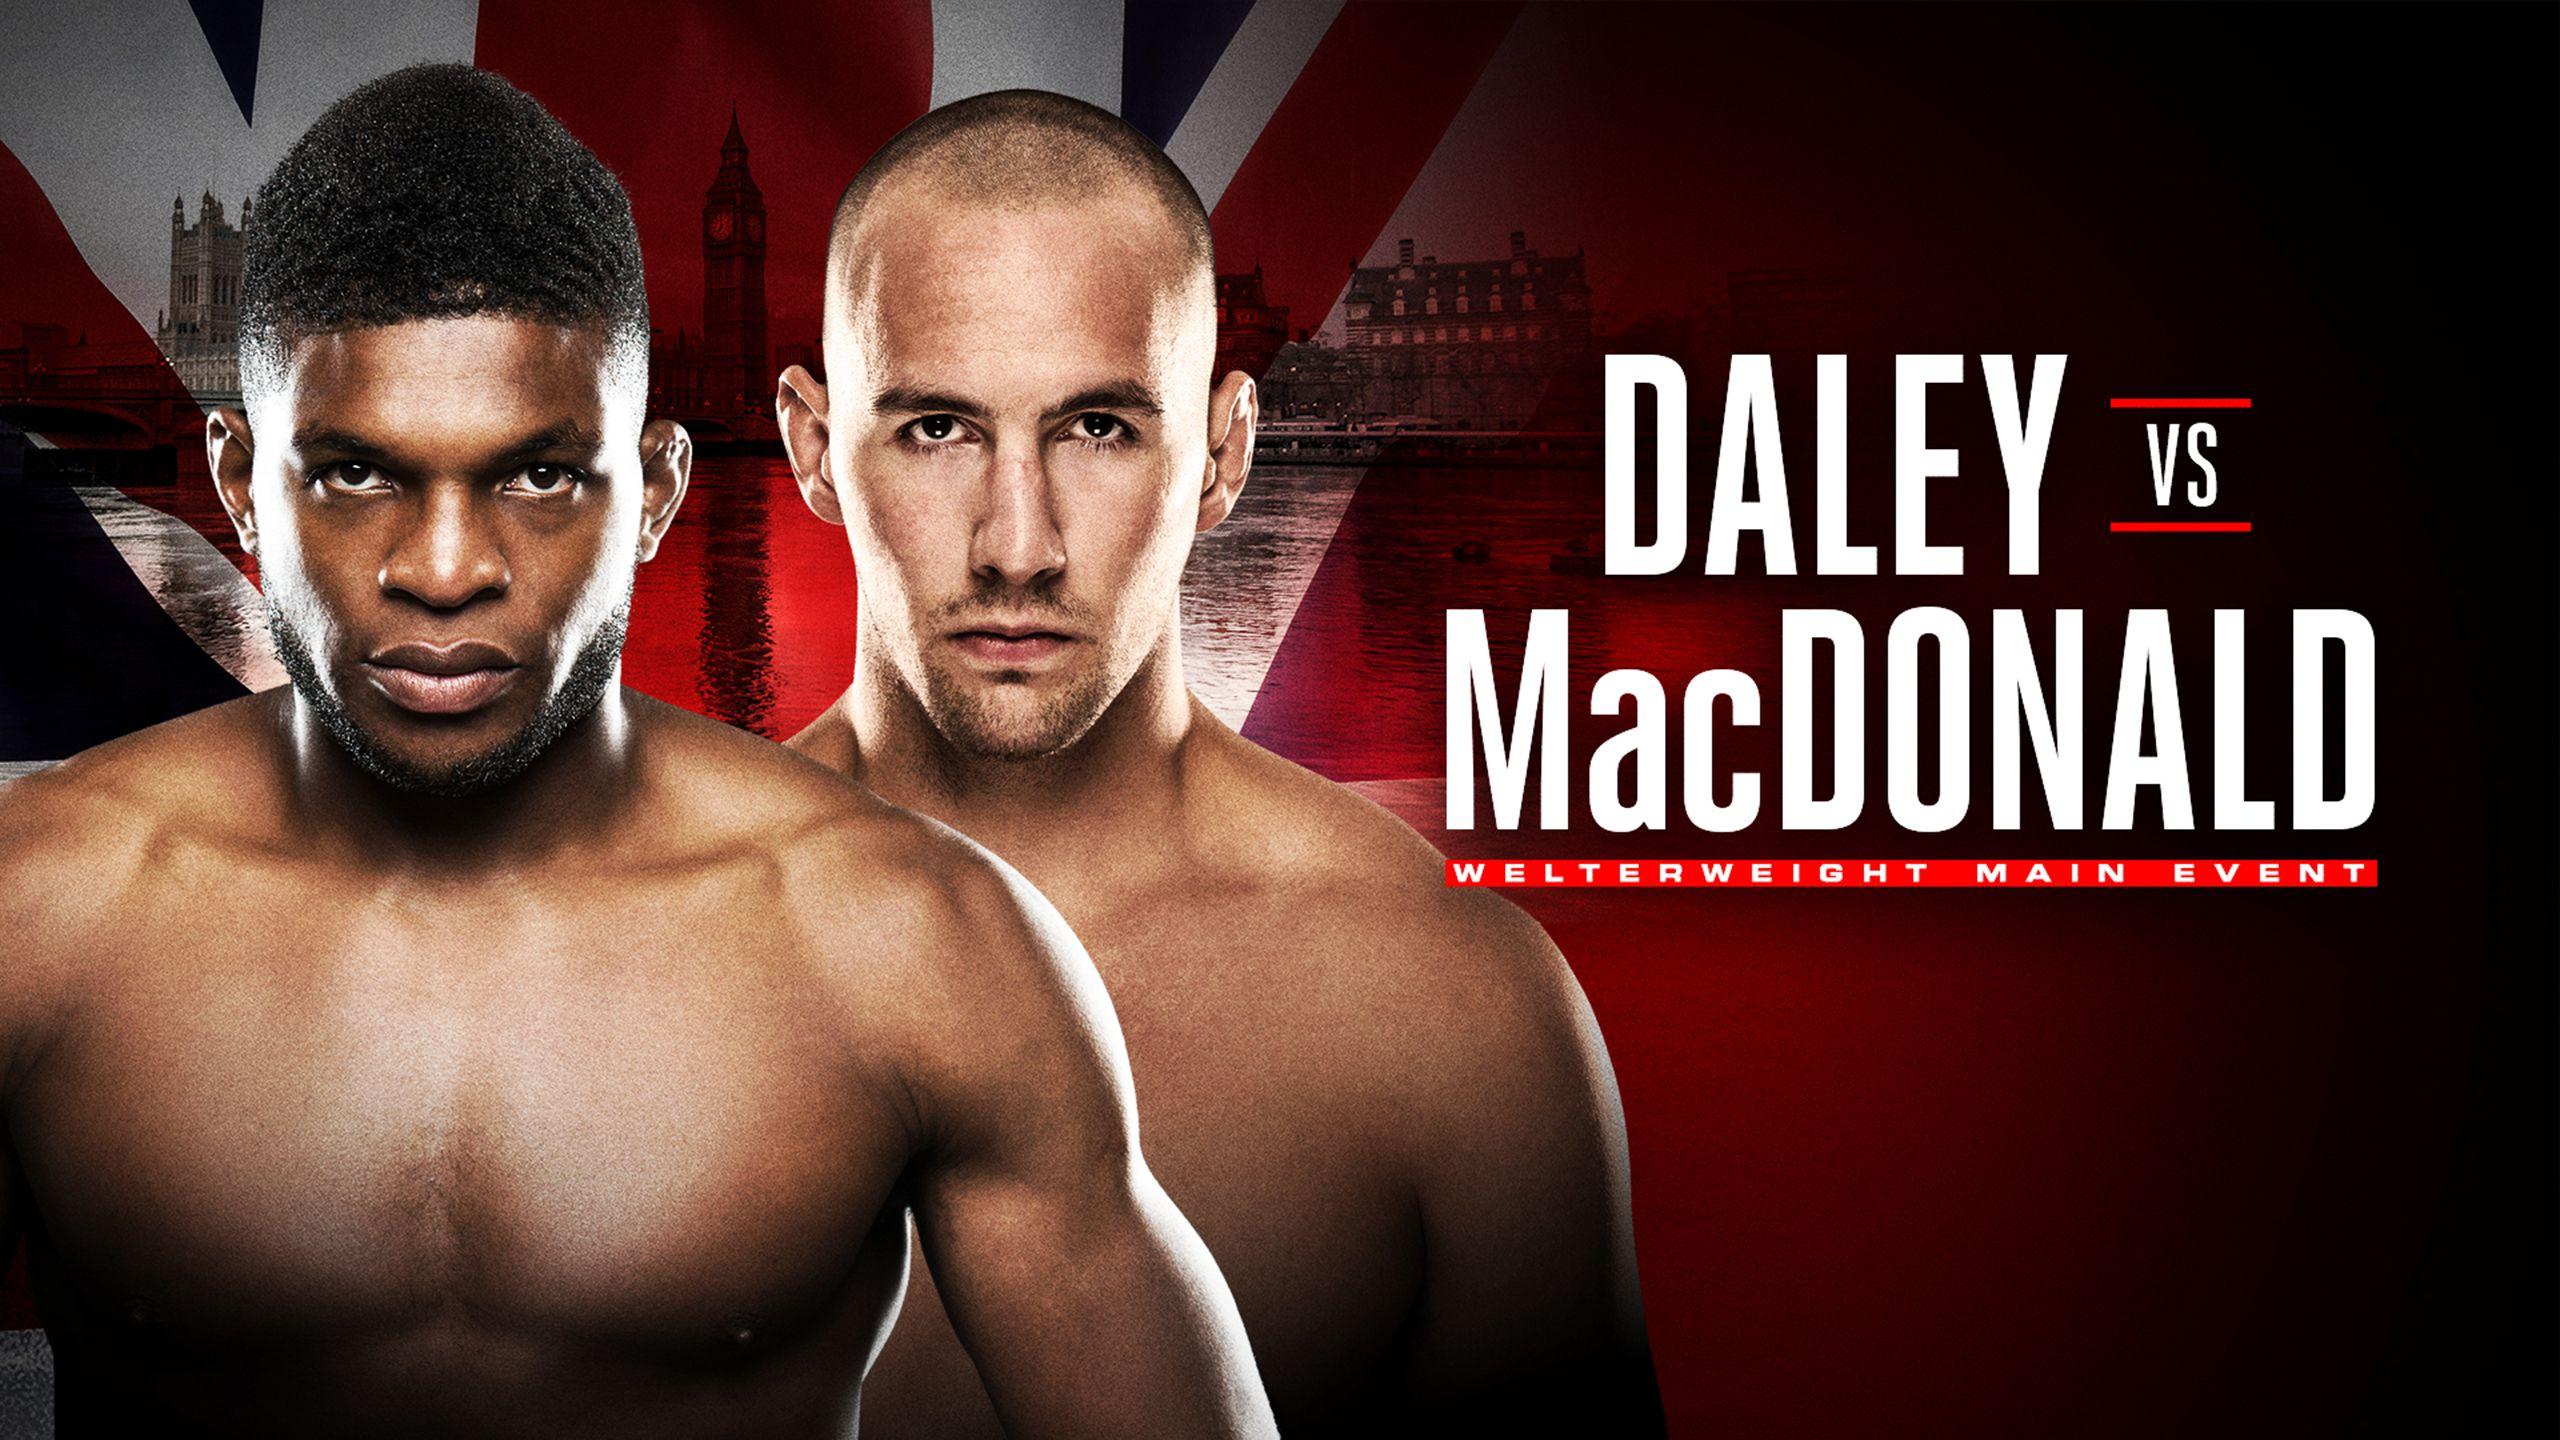 In Spanish - Rory Macdonald vs. Paul Daley (Main Event)